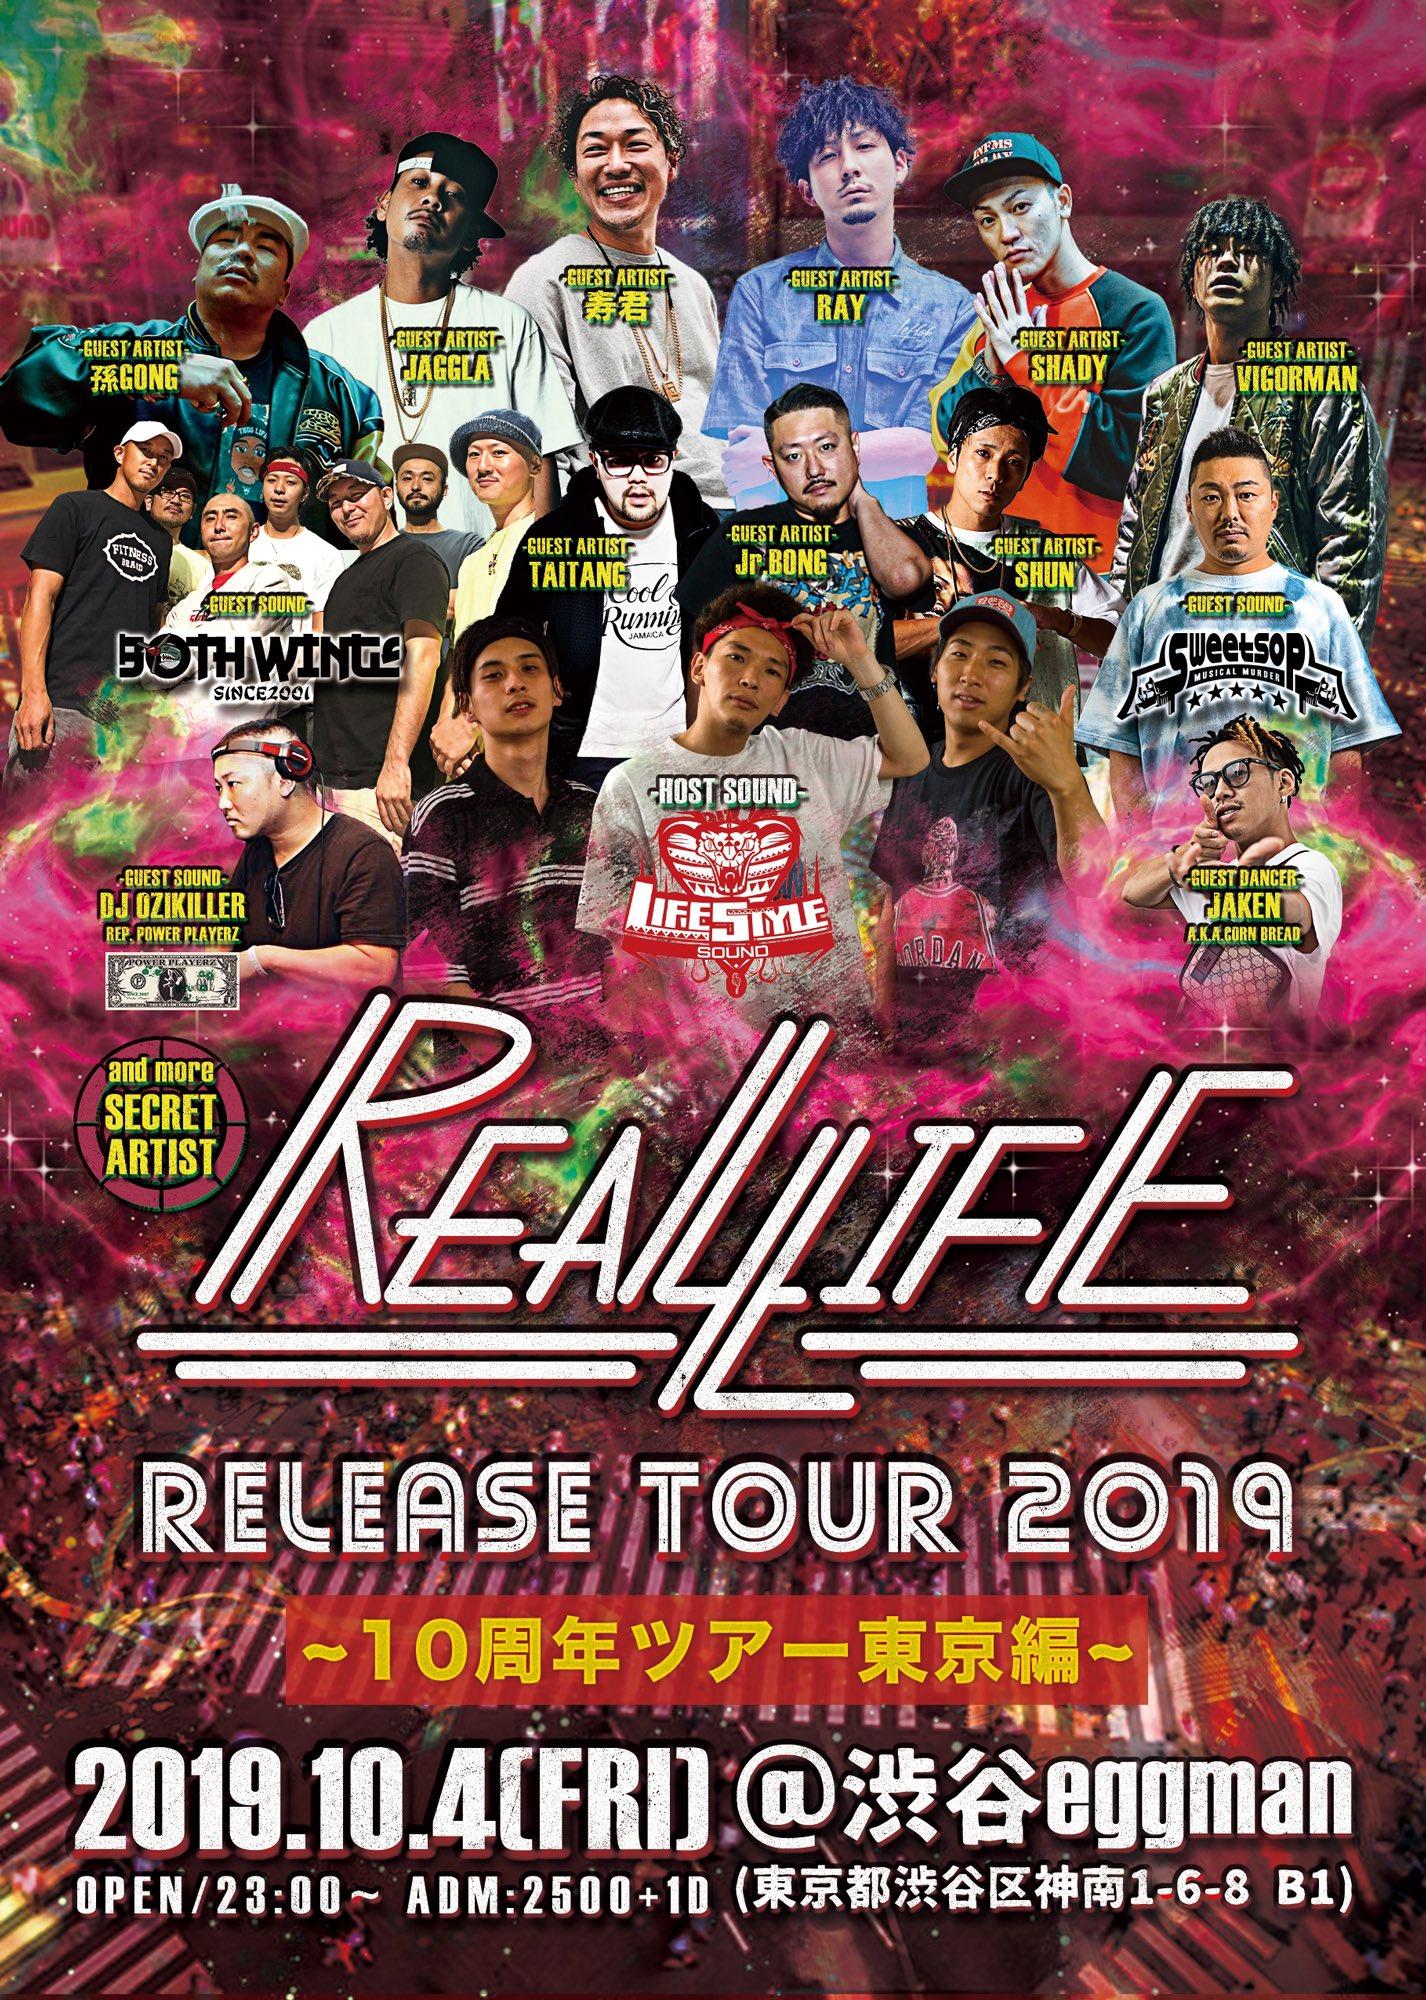 LIFE STYLE RELEASE TOUR 2019<br>~10周年ツアー東京編~